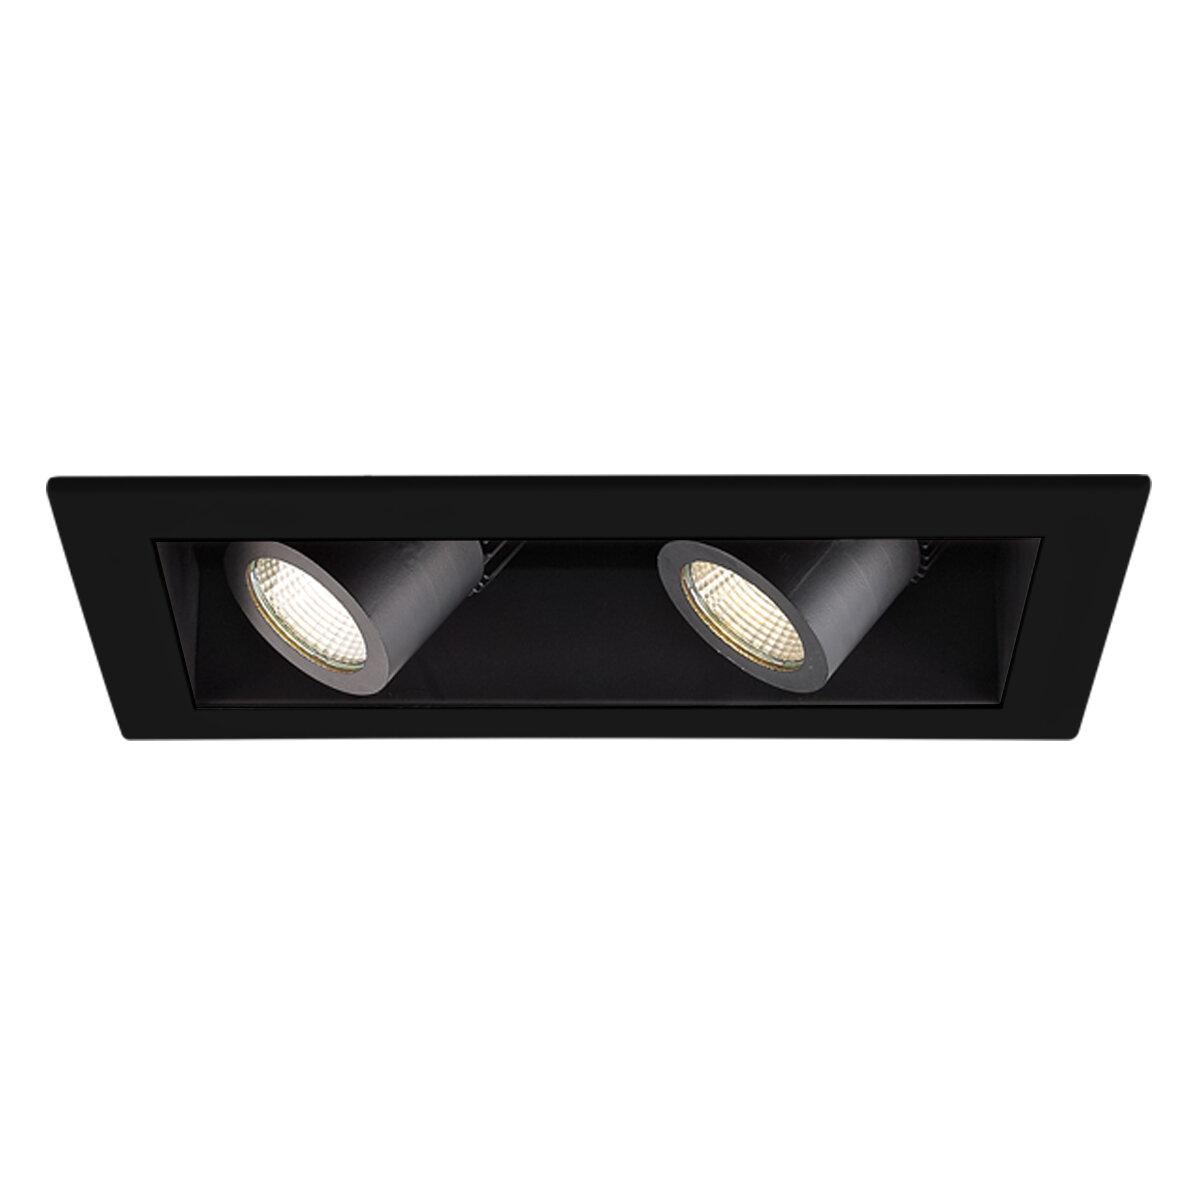 Wac Lighting Precision Led Multi Spotlight Recessed Lighting Kit Wayfair